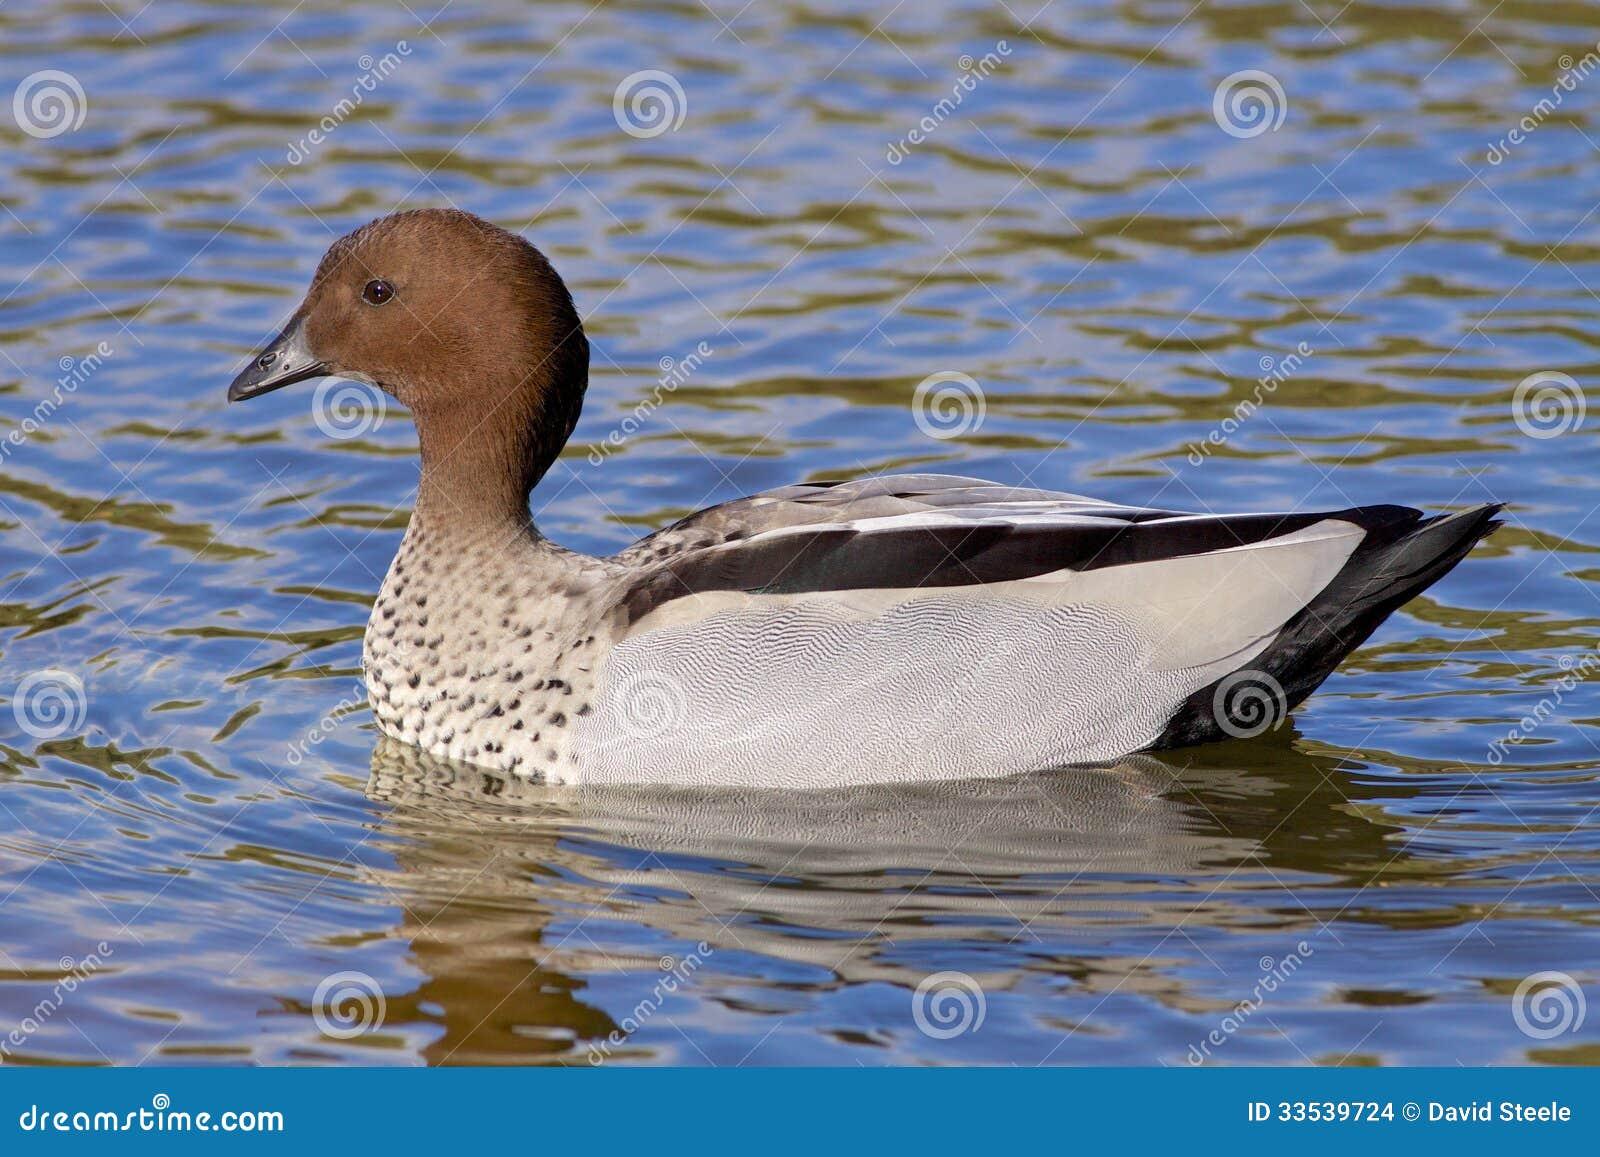 Canard en bois australien images stock image 33539724 for Architecture canard